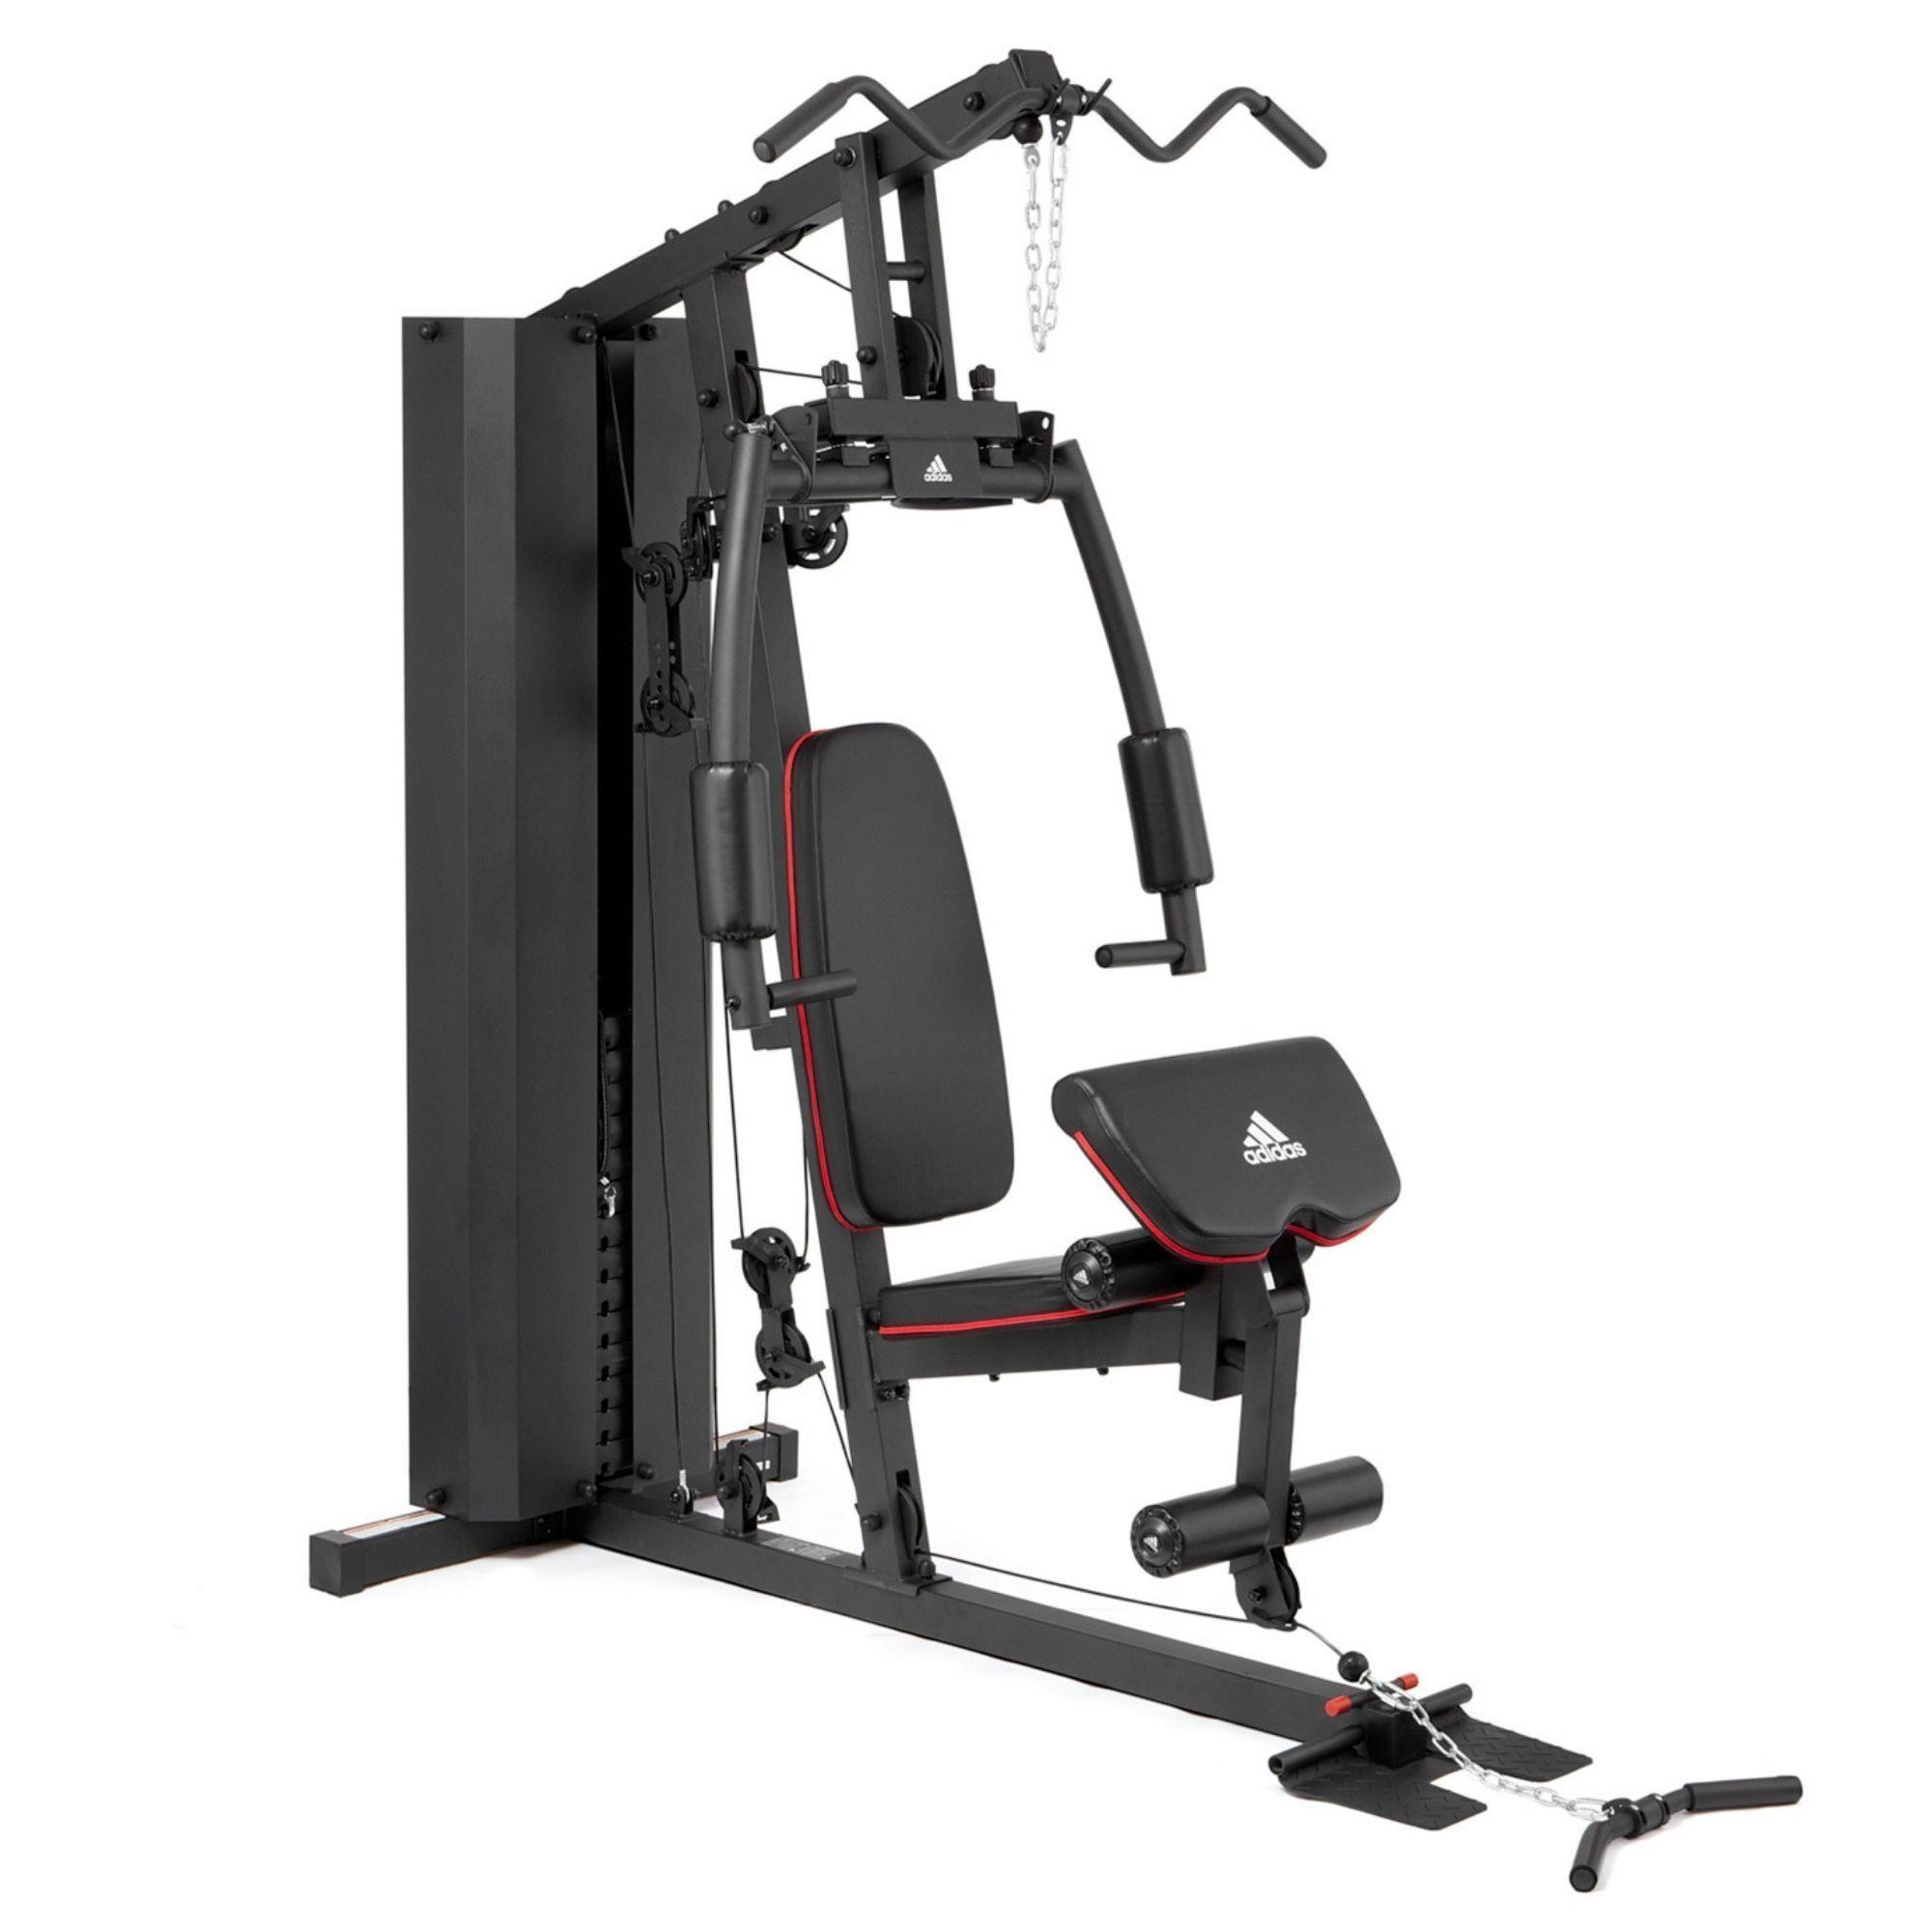 Multiestación Musculación Máquina Home Gym Adidas